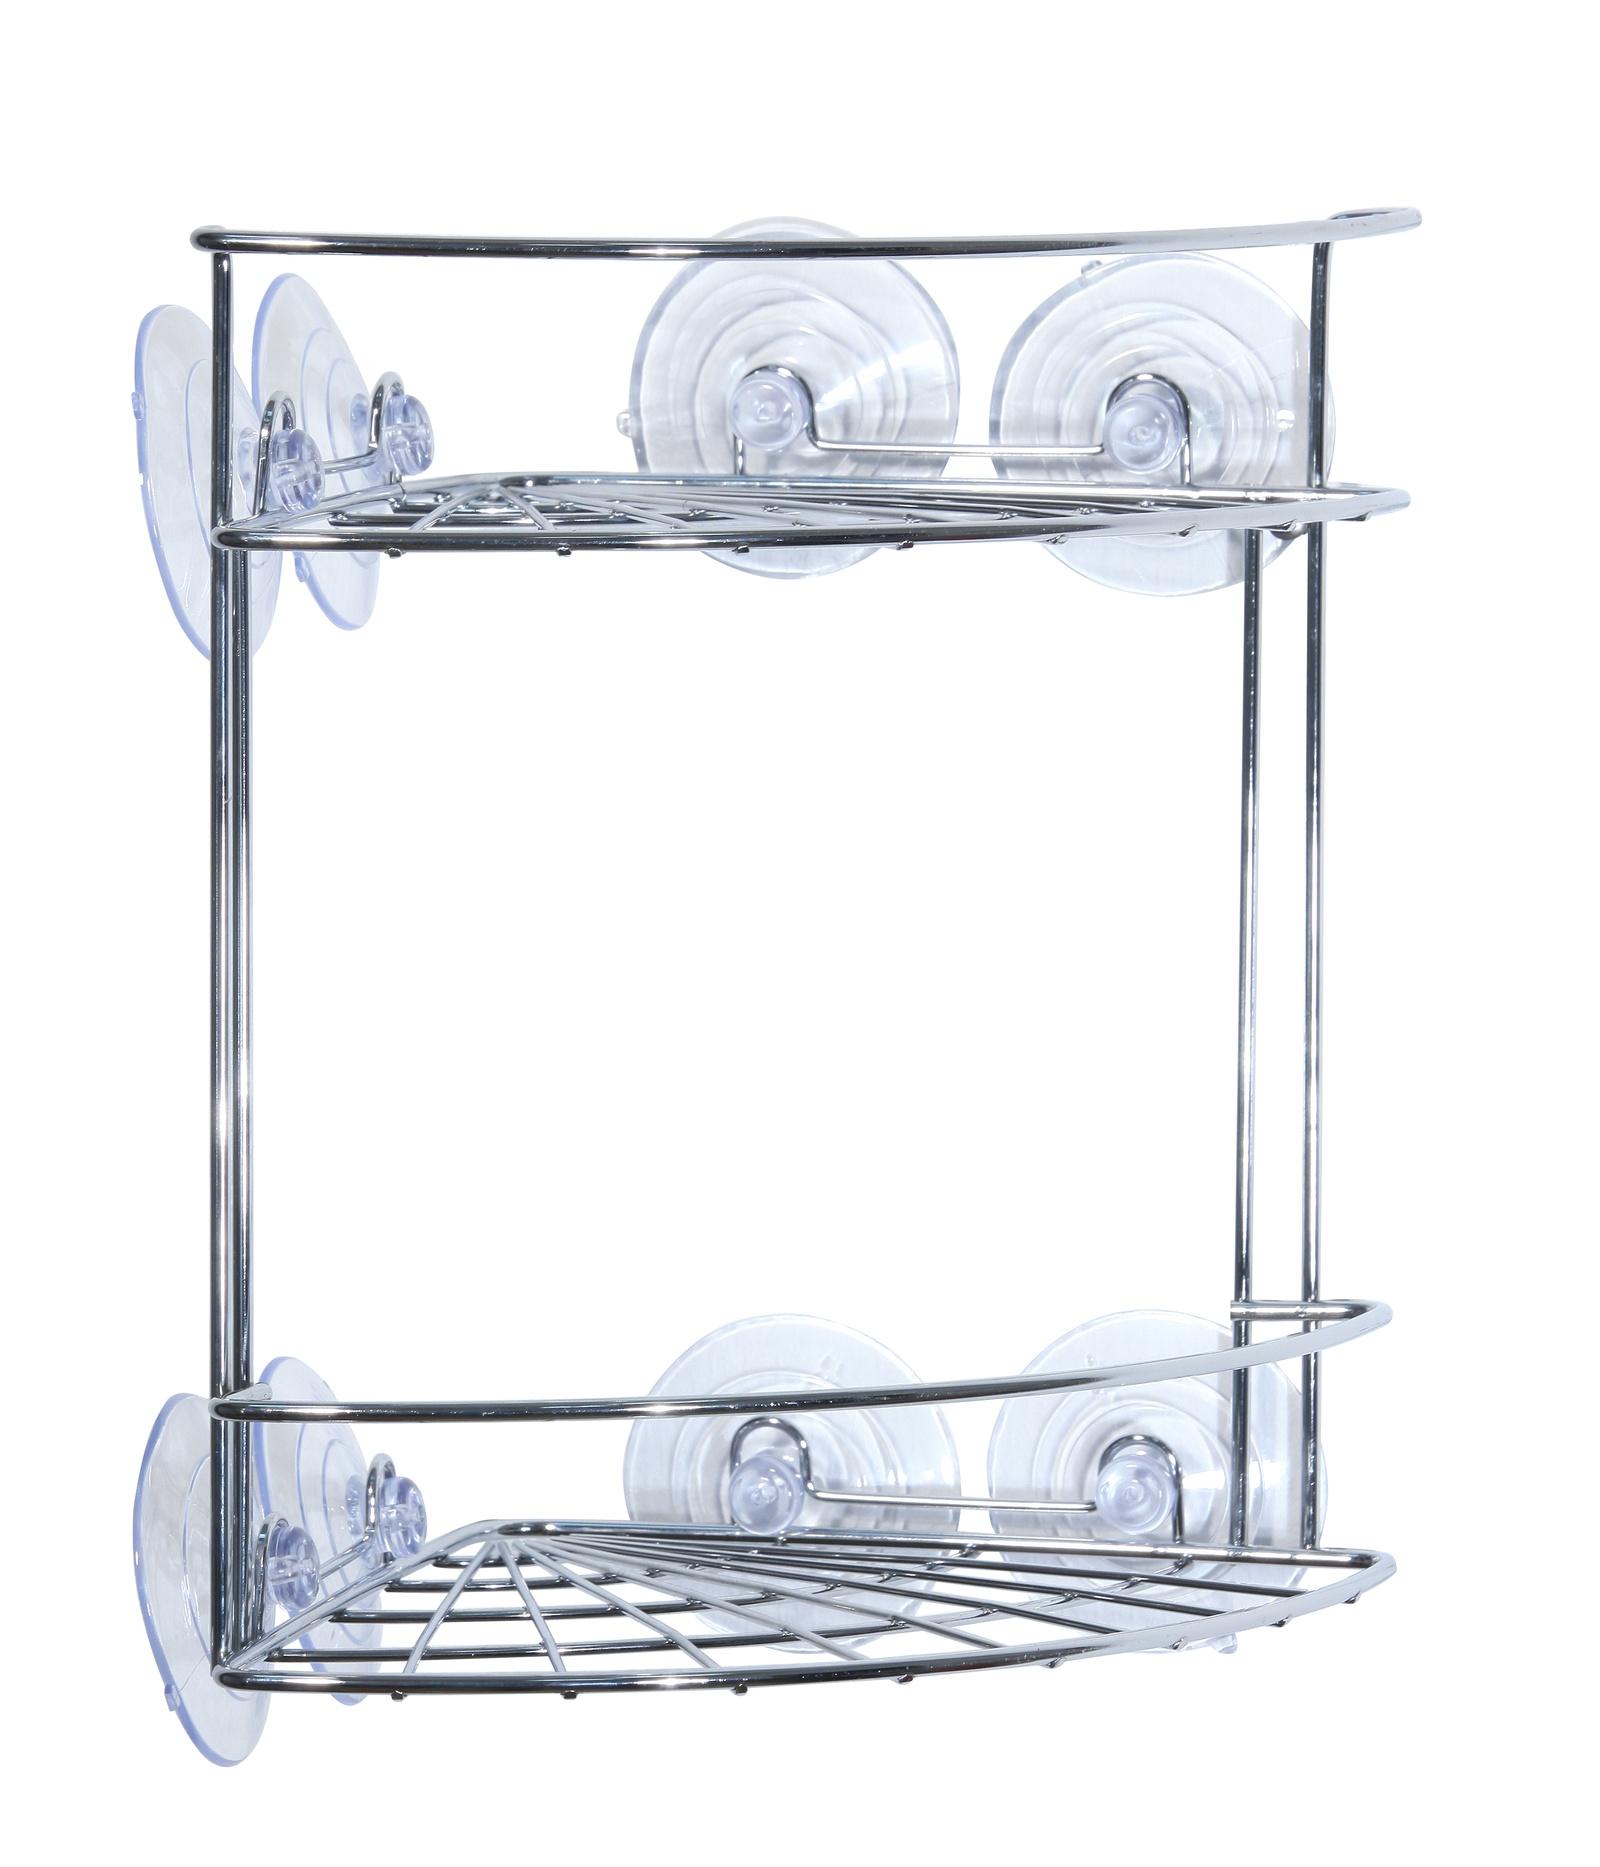 Полка для ванной комнаты Vanstore Neo, серебристый мыльница fresh code море ракушка на присоске цвет серебристый 14 х 9 5 х 2 см